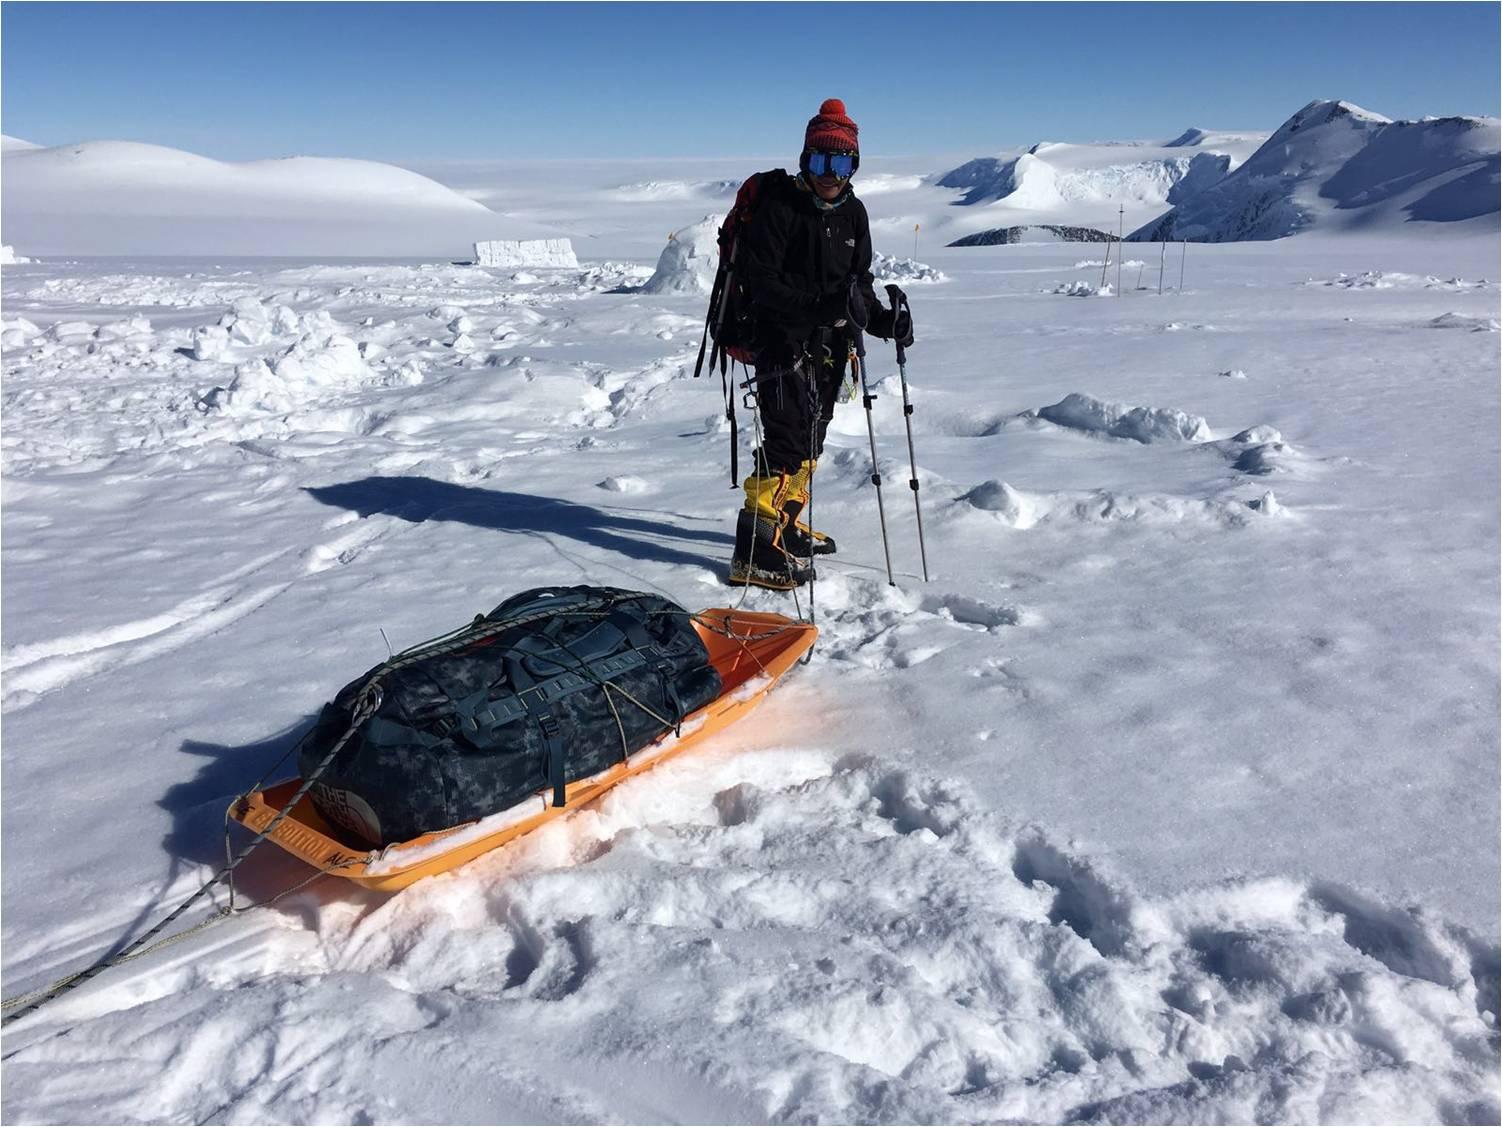 On way to conquer Vinson Matiff